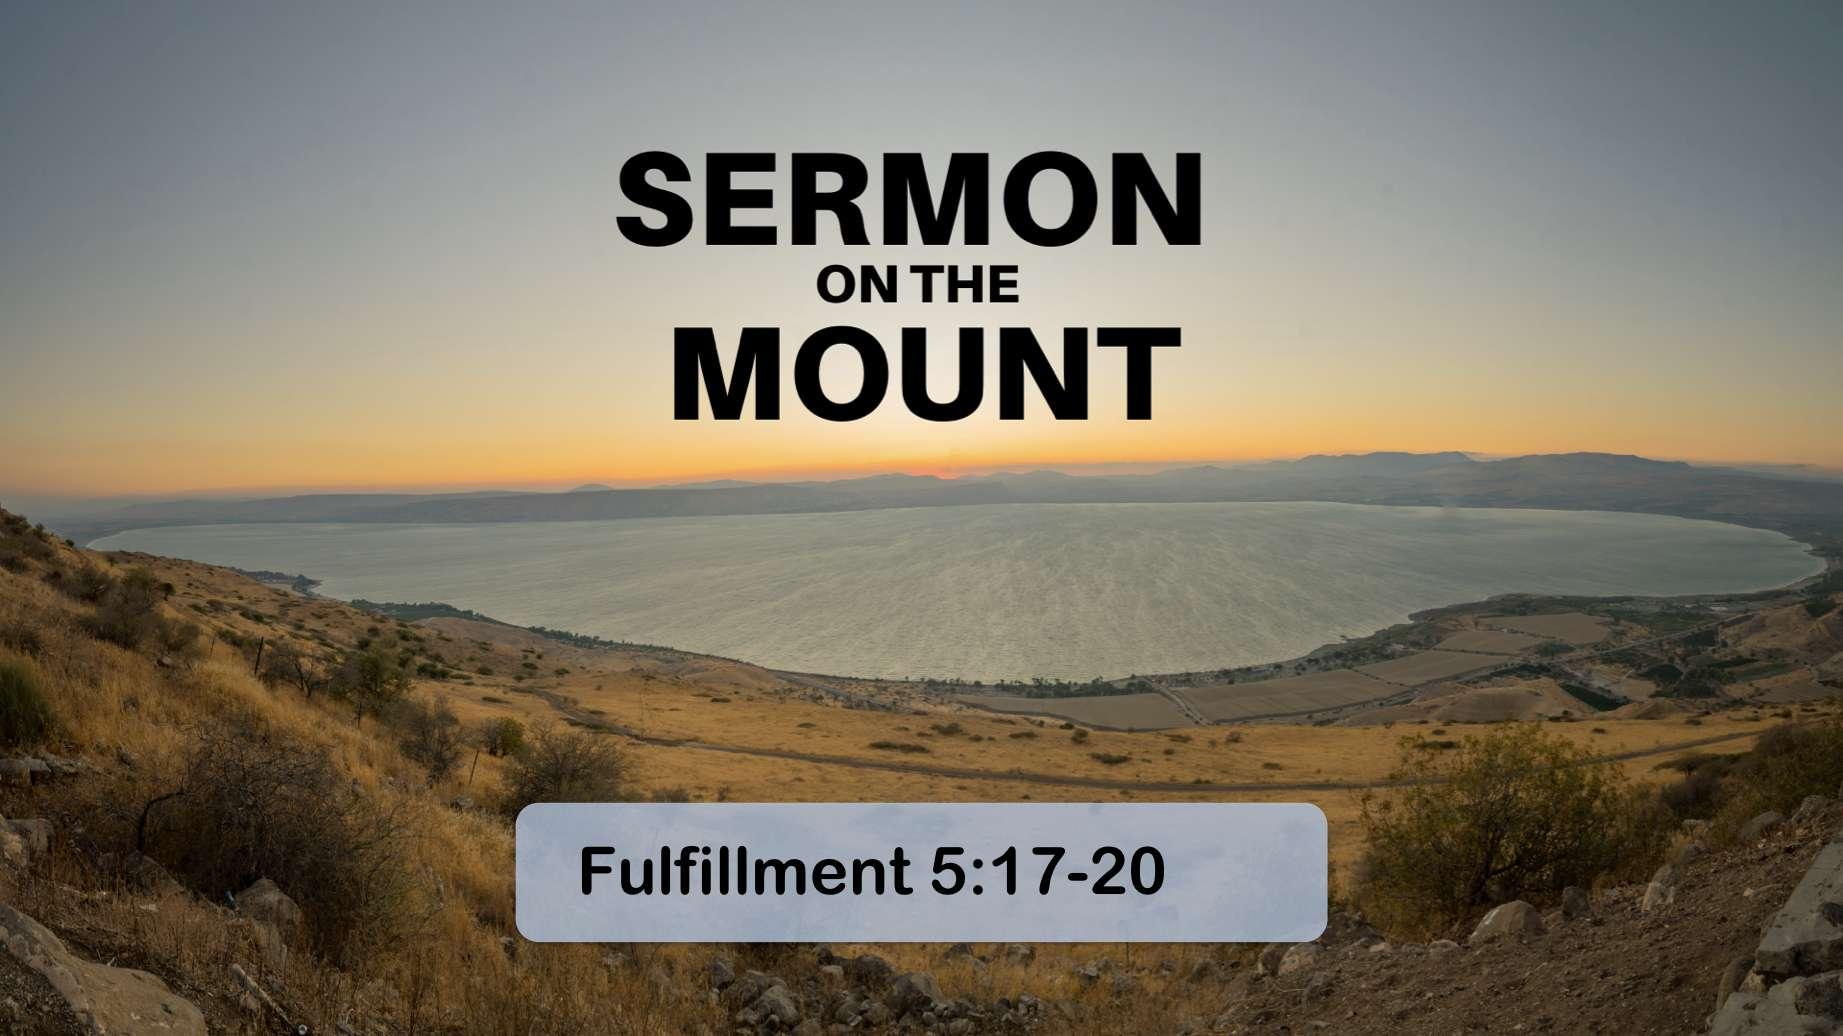 Sermon on the Mount 3 – Fulfillment